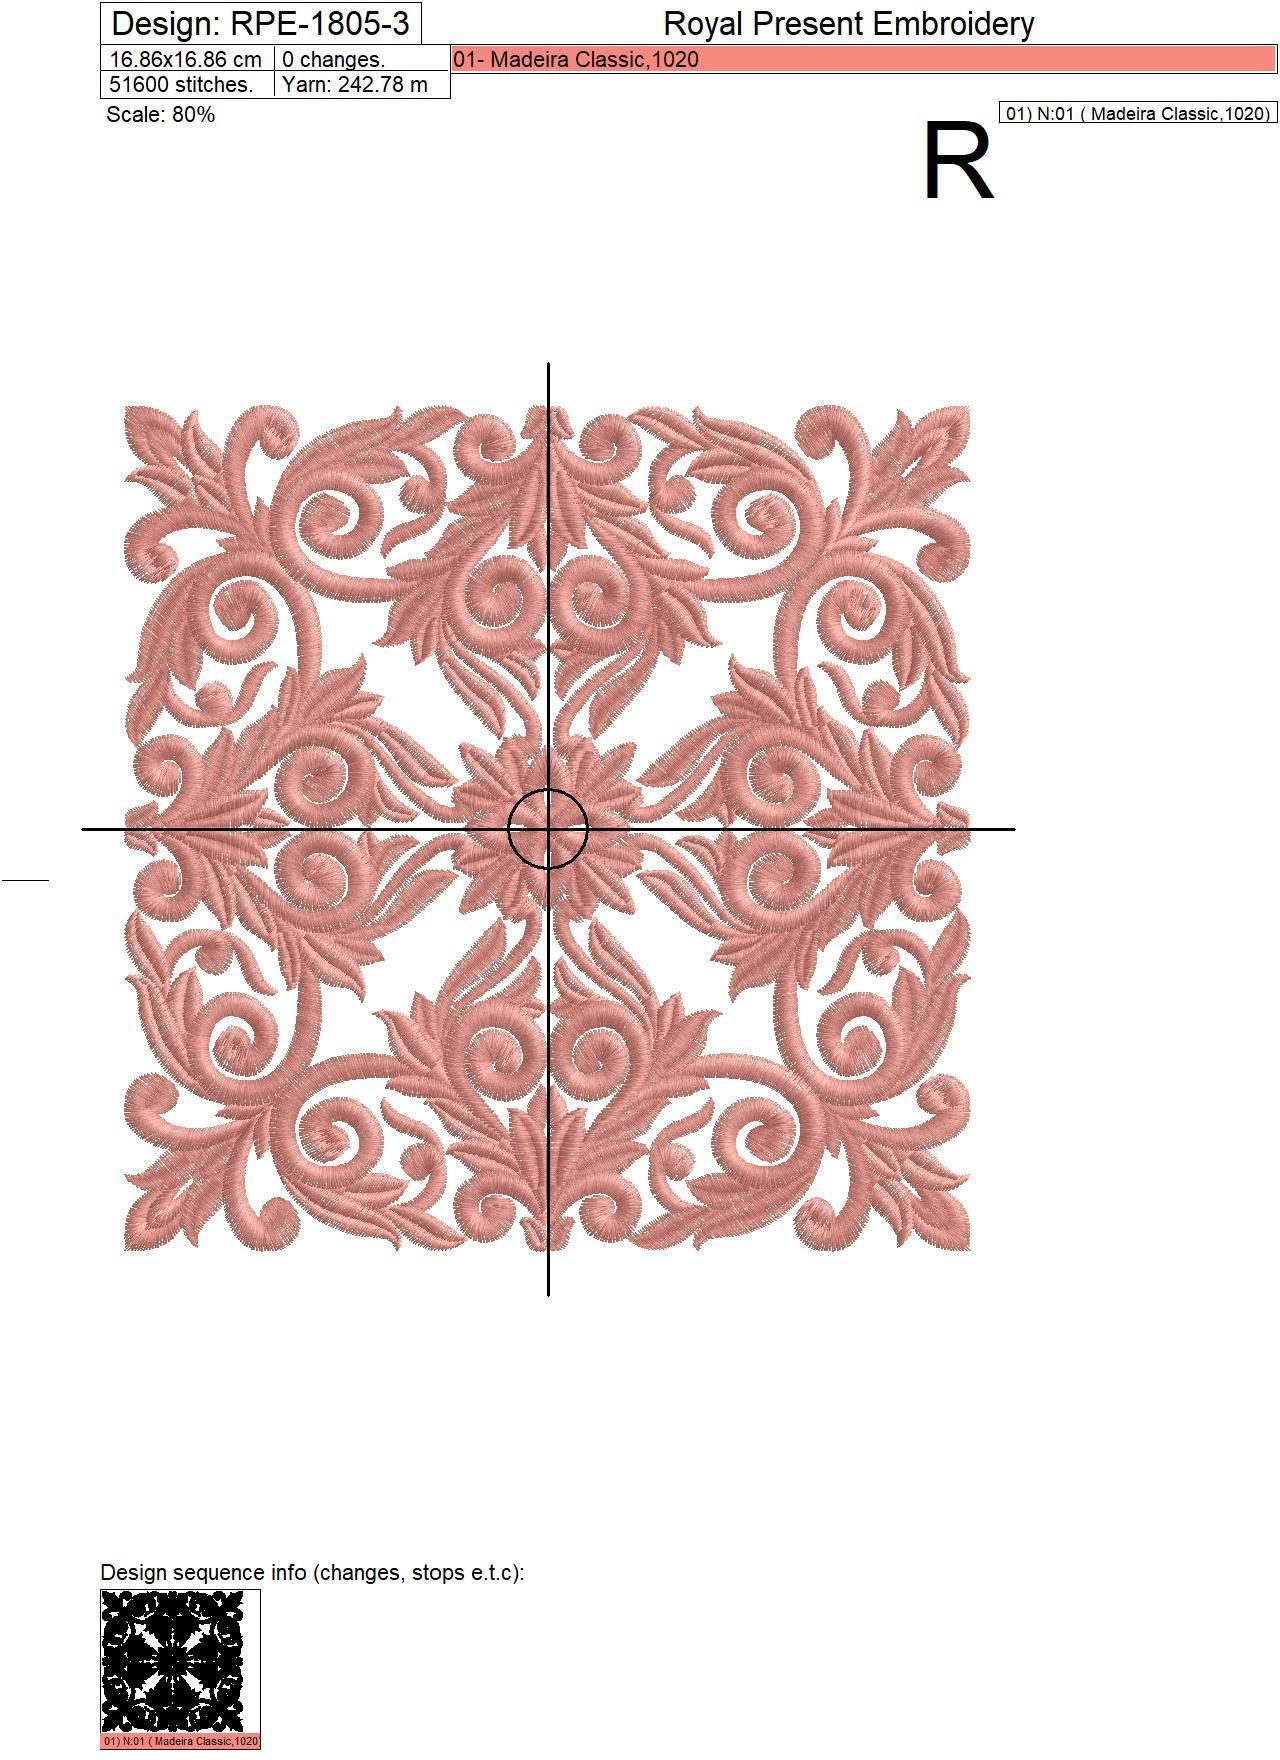 Retro style Machine embroidery design - 3 sizes